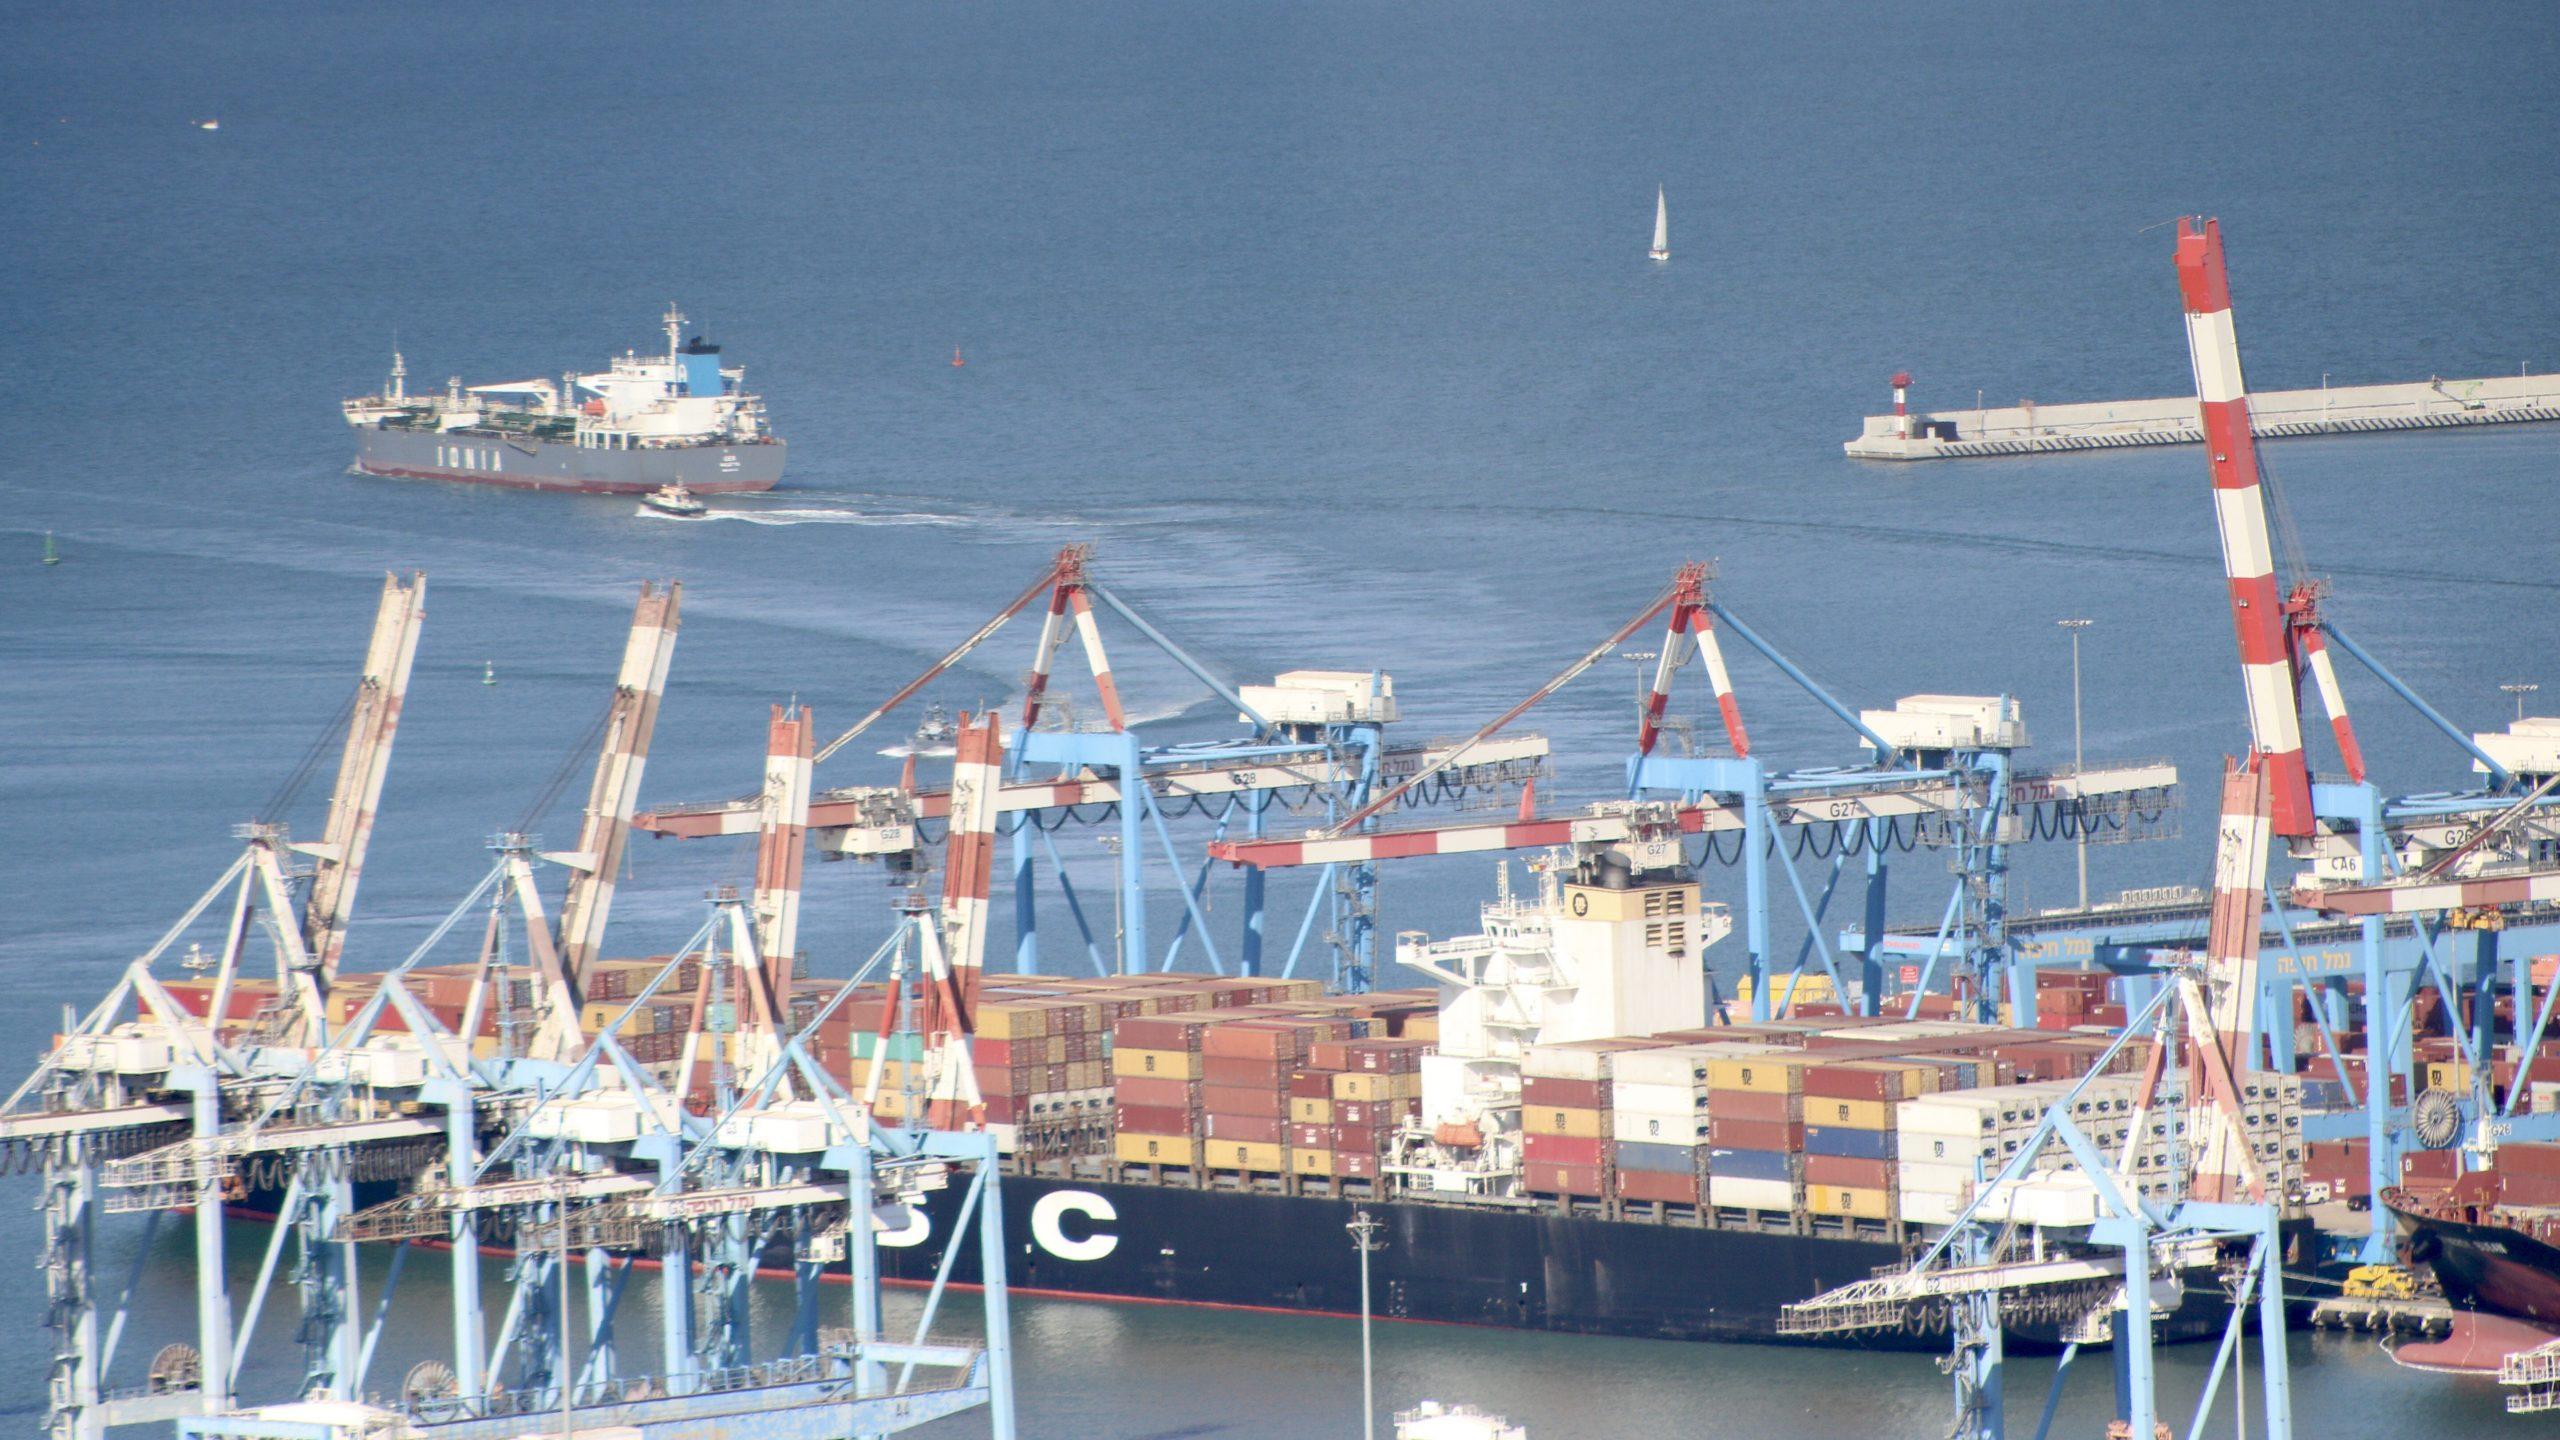 MSC Paris Brought Cargo from UAE to Haifa